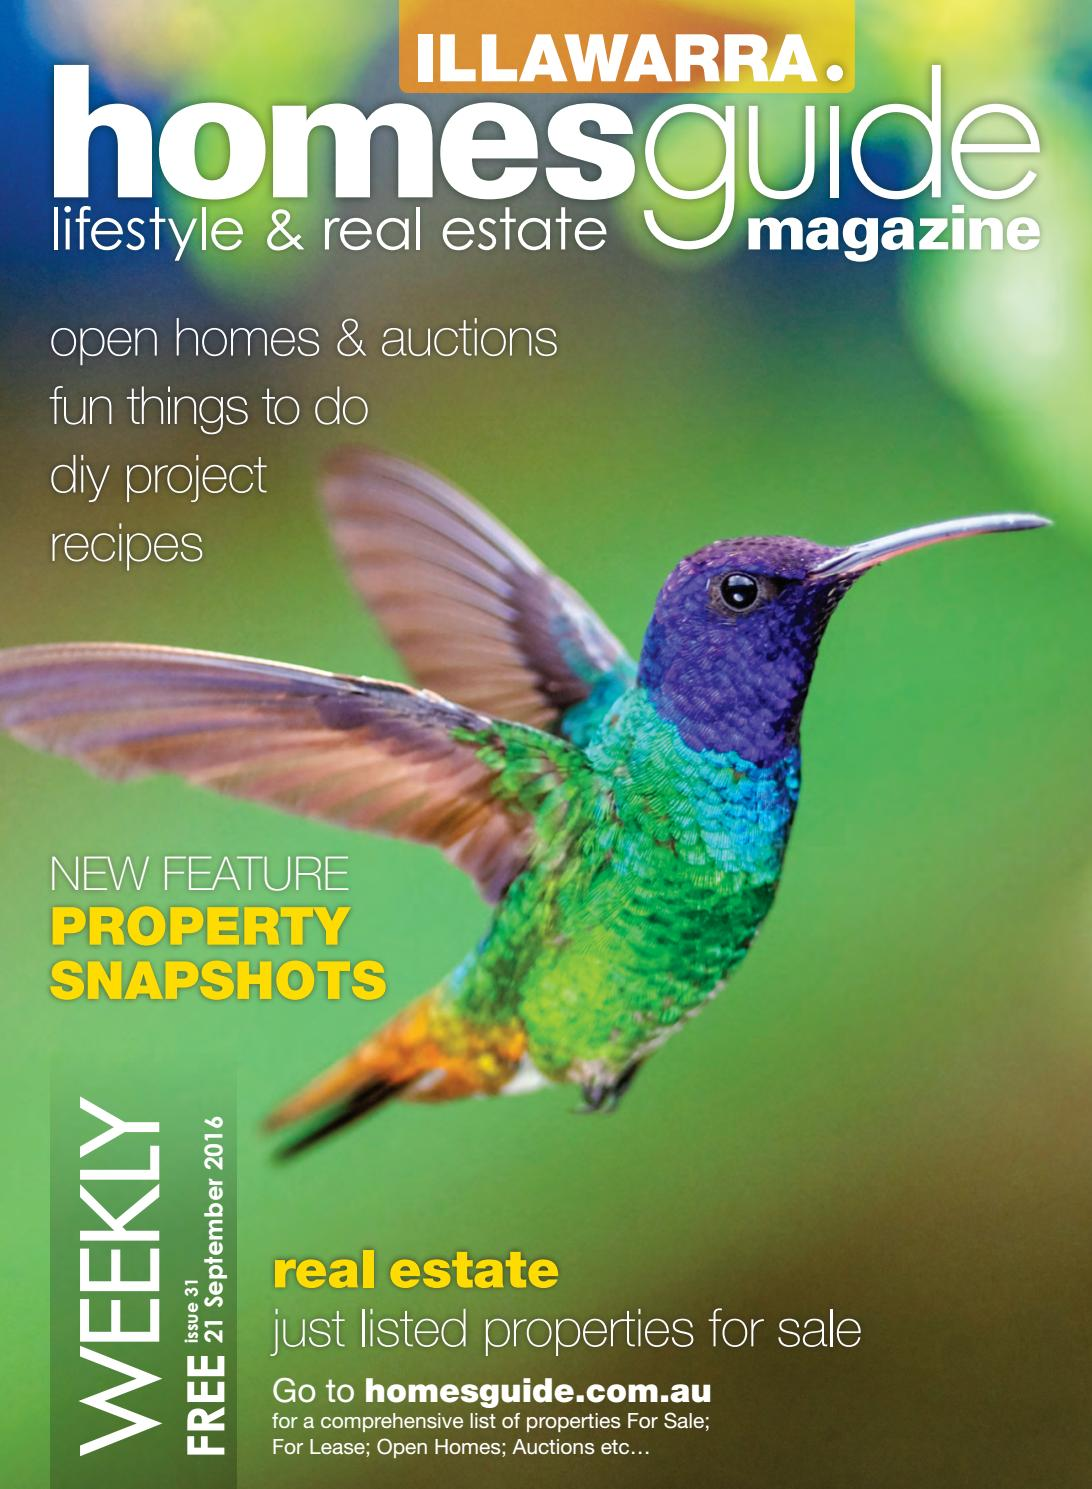 Illawarra Homesguide Magazine Issue 31 By Homesguide Issuu